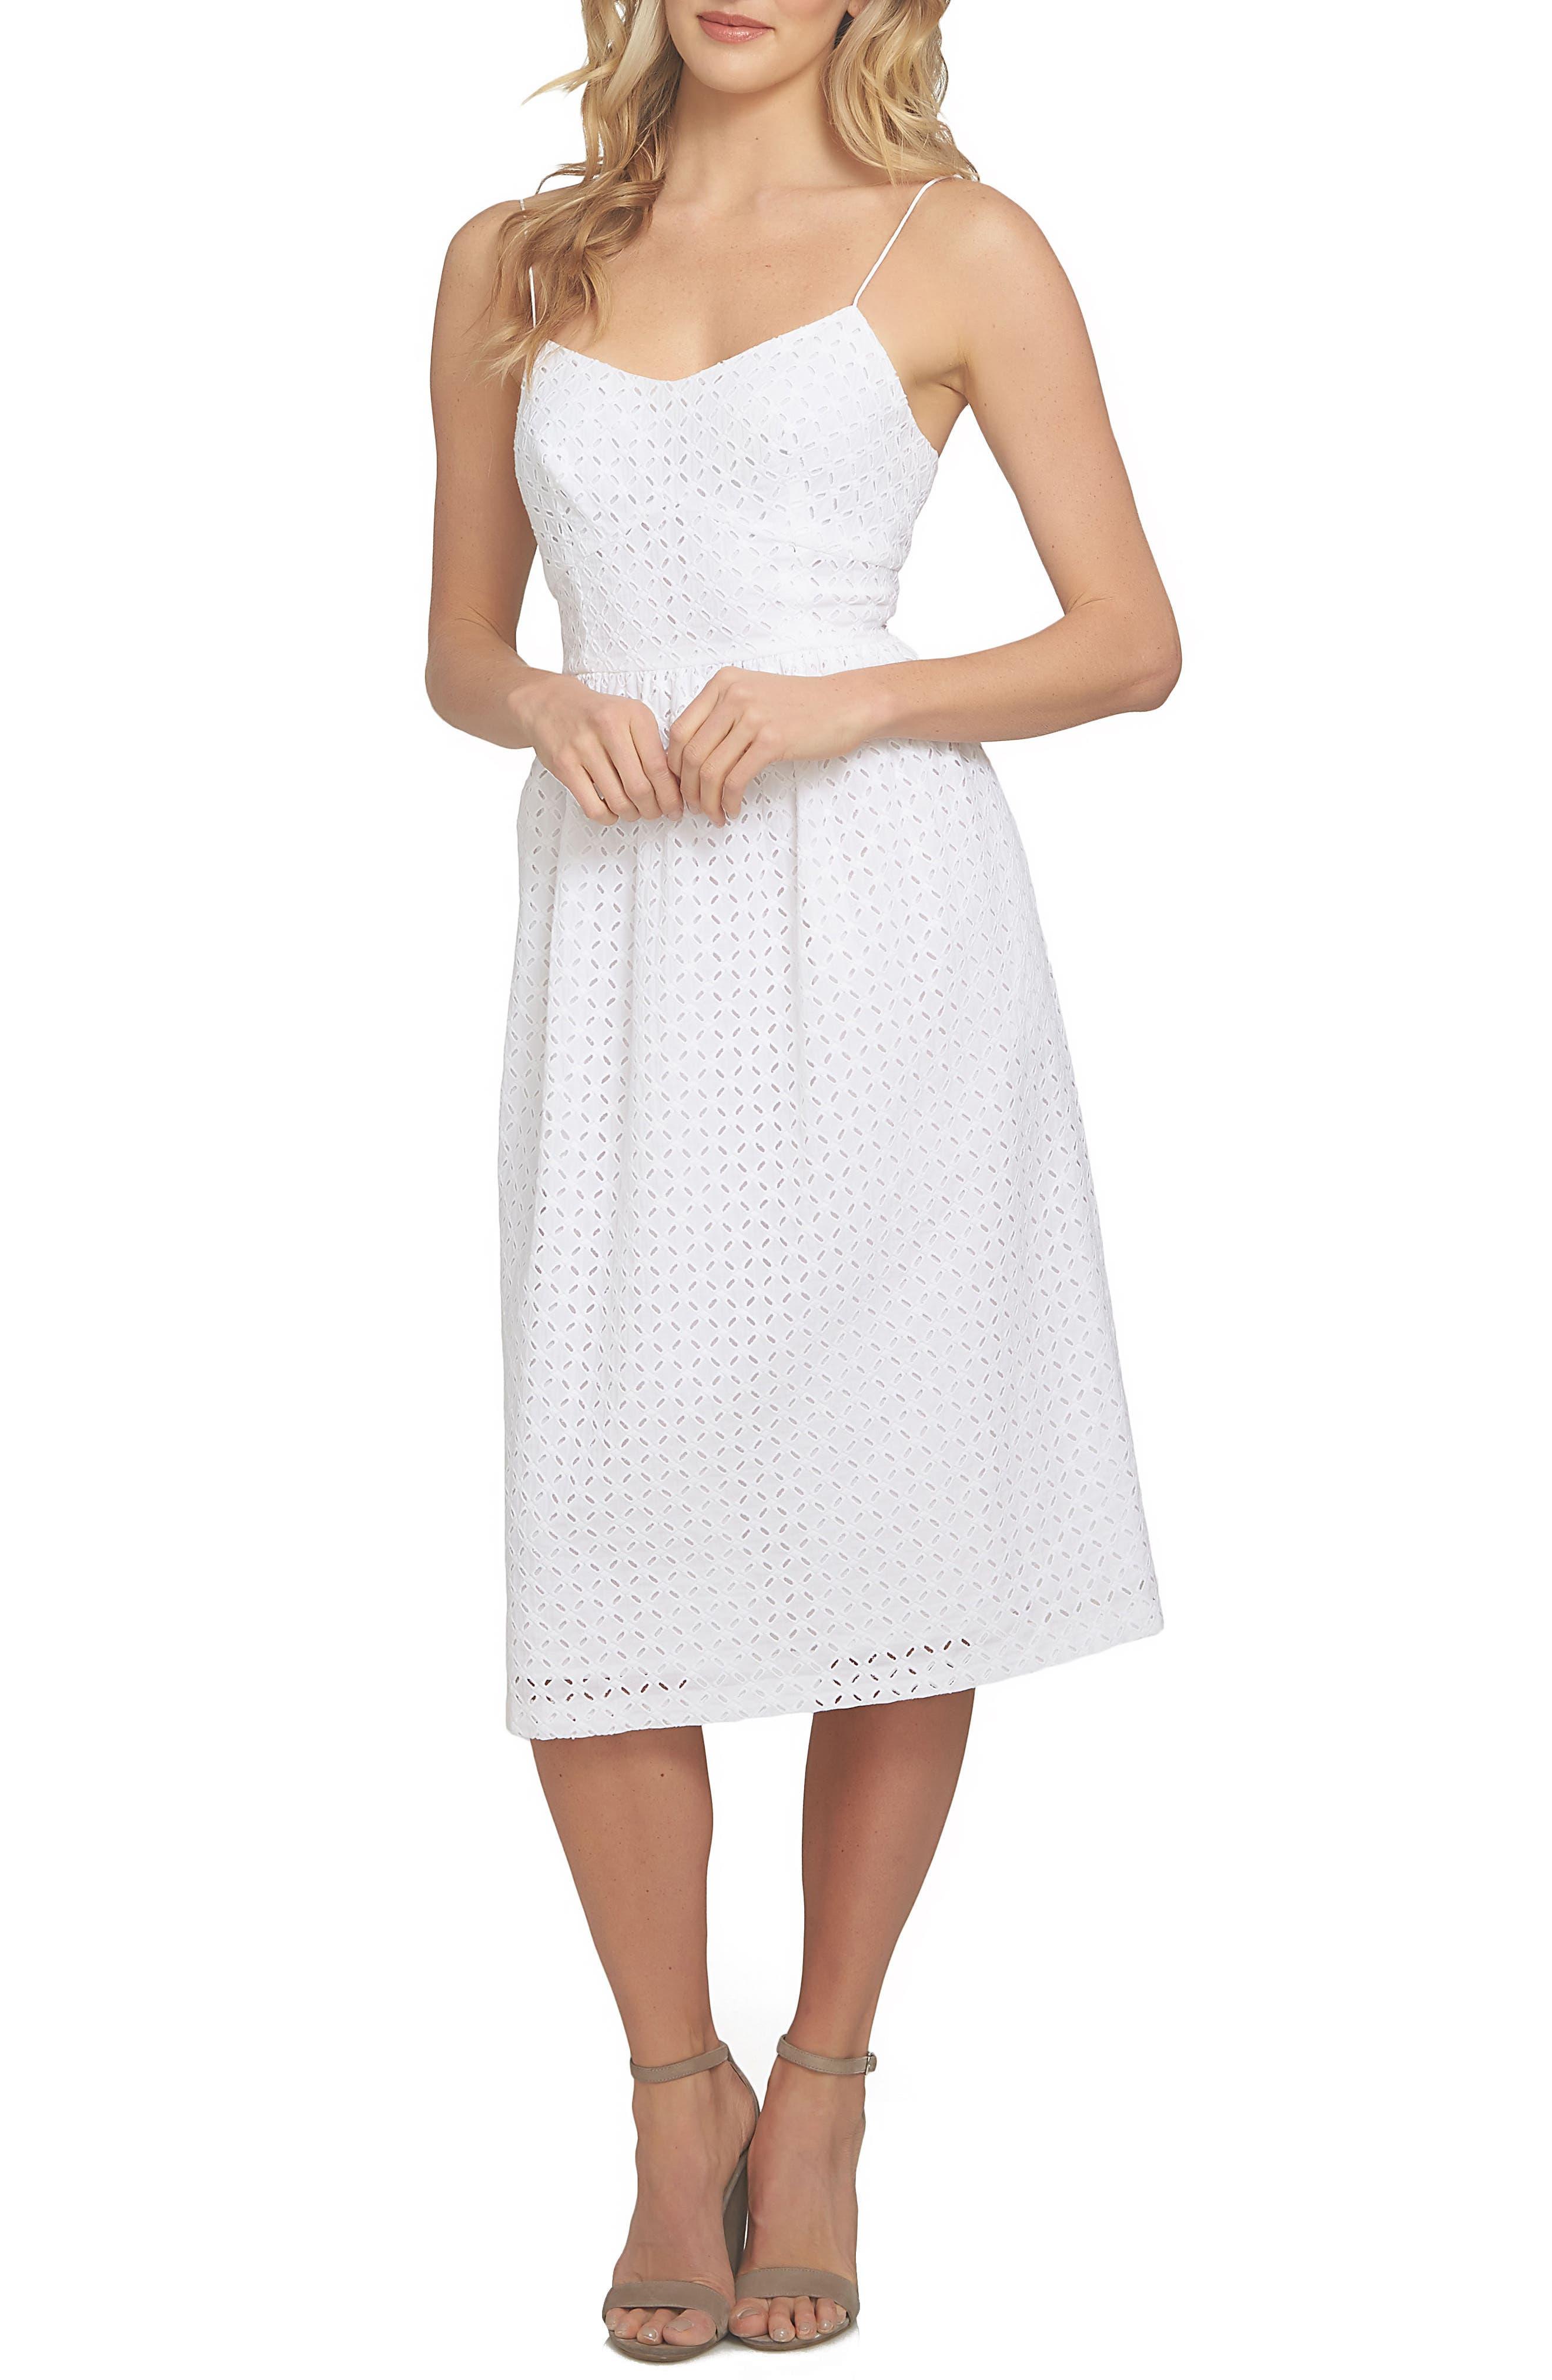 Alternate Image 1 Selected - CeCe Aurora Eyelet Midi Dress (Regular & Petite)